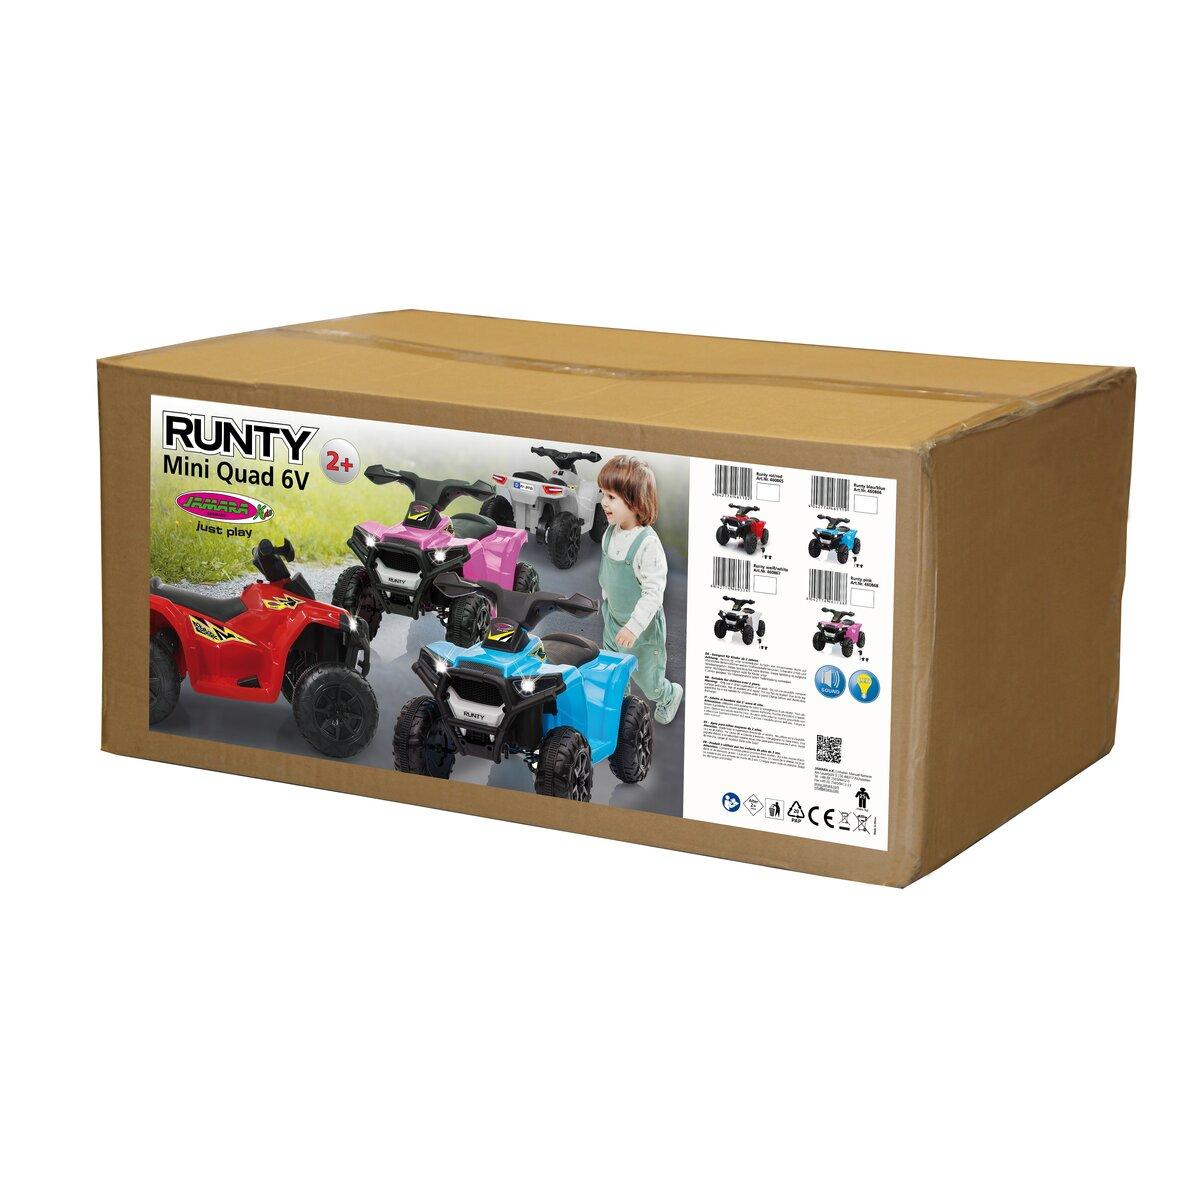 Jamara Ride-on Mini Quad Runty 6V modrý